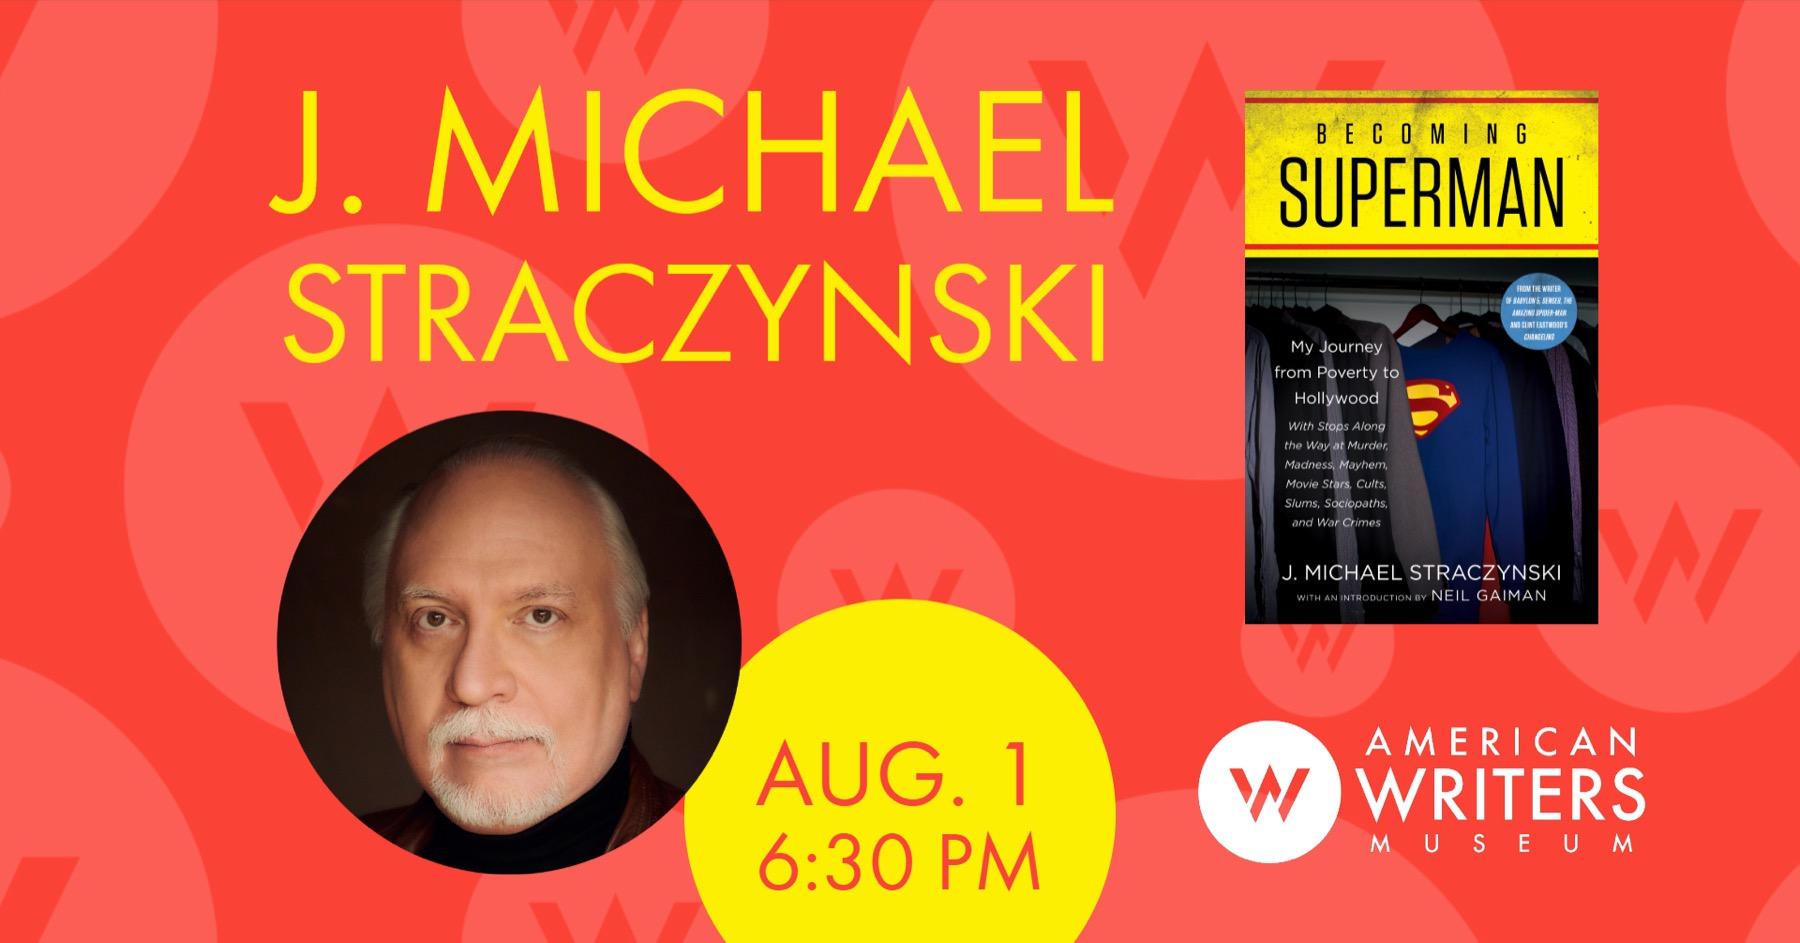 J. Michael Straczynski: Becoming Superman